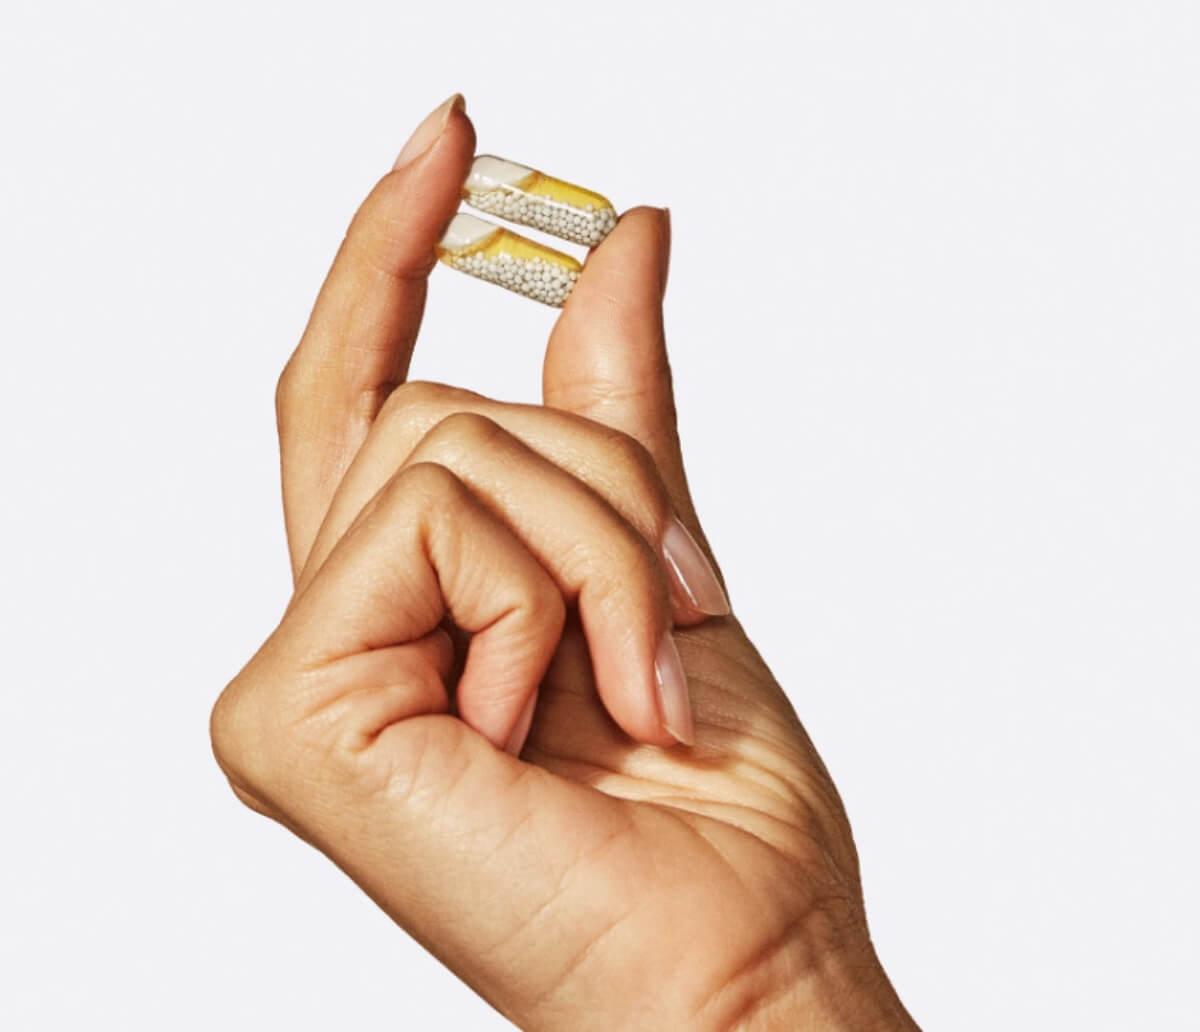 hand holding vitamins